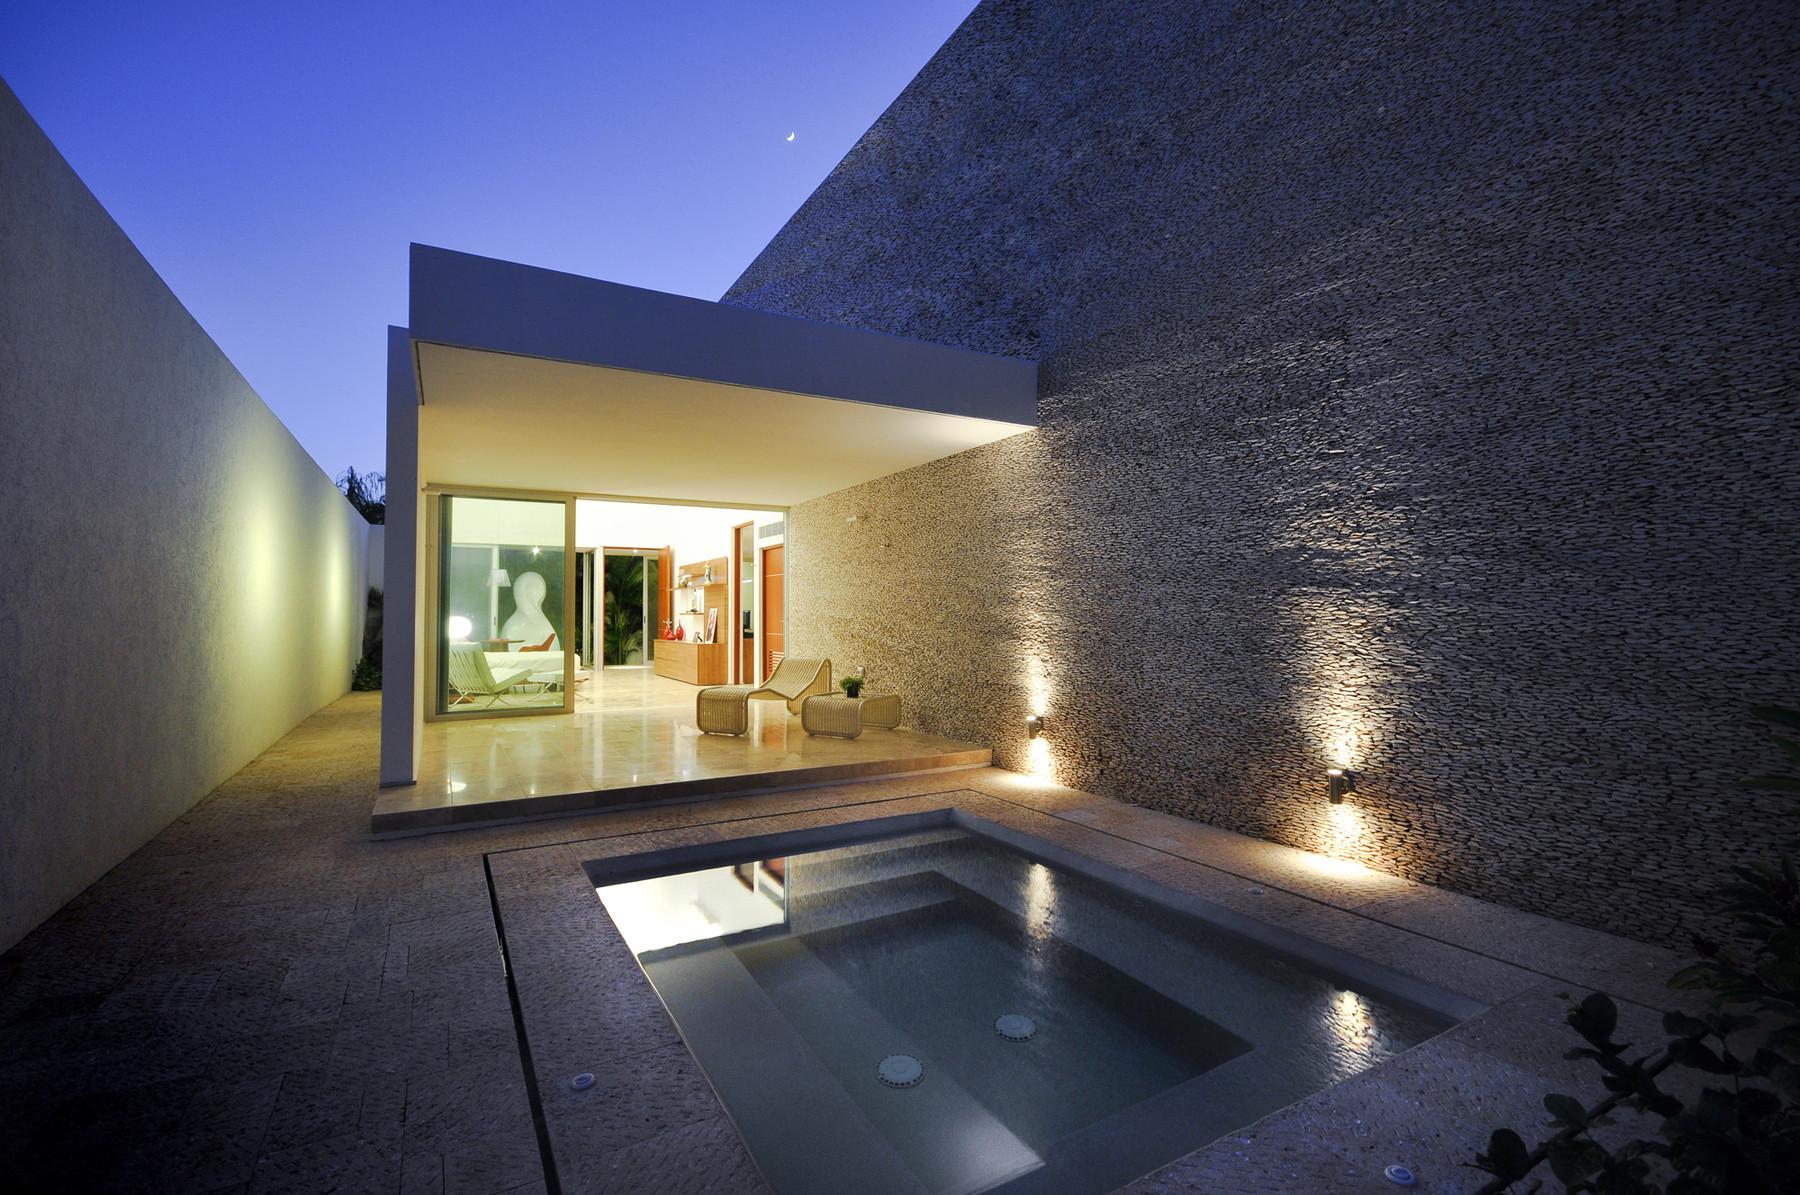 Gallery of Rajuela House  Muoz Arquitectos  12